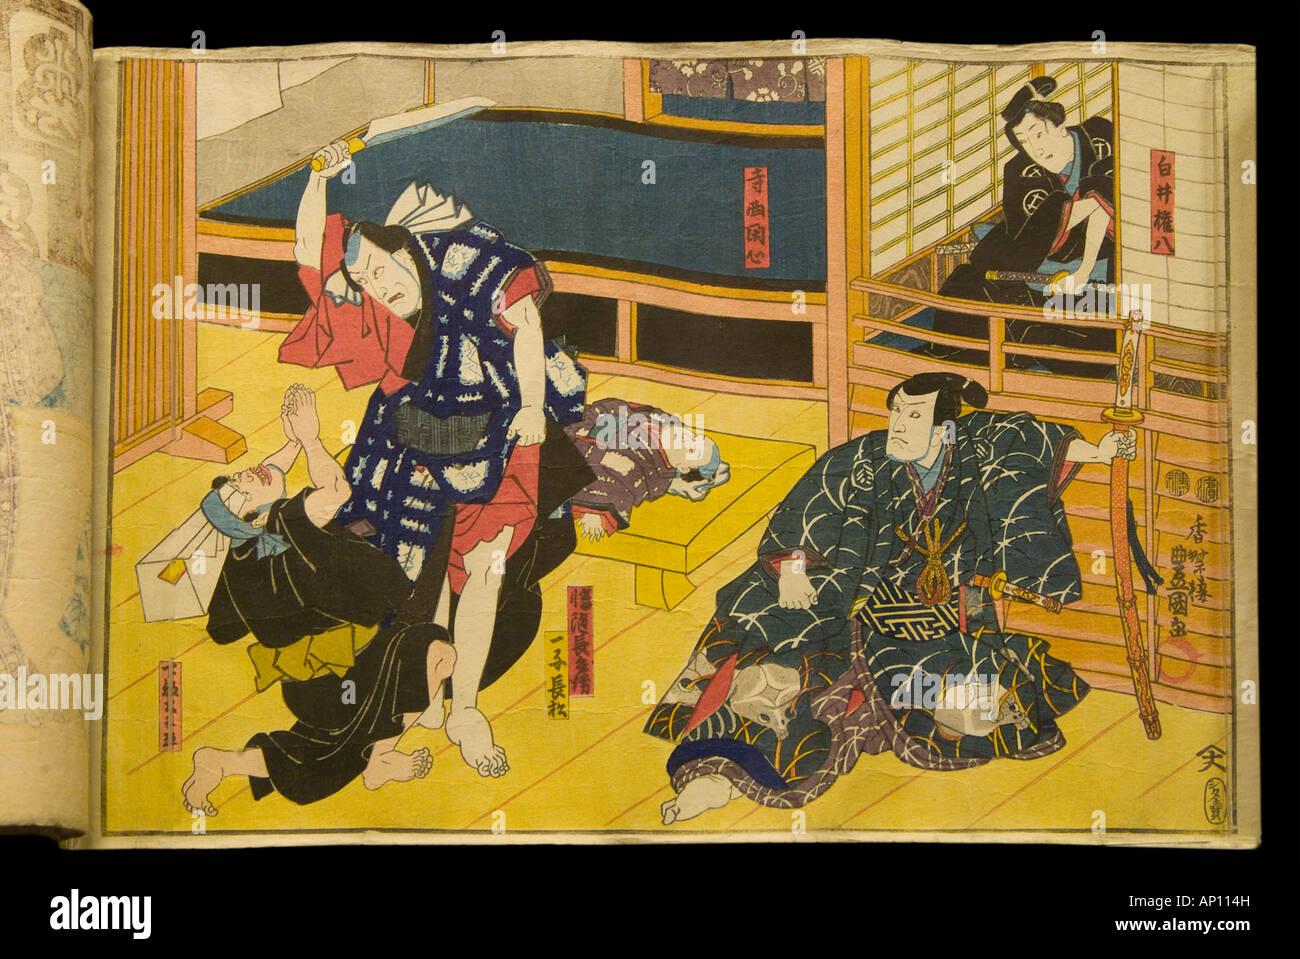 print from play sukeroku irohano hanami doki at nakamura 1850 kunisada sukeroku - Stock Image